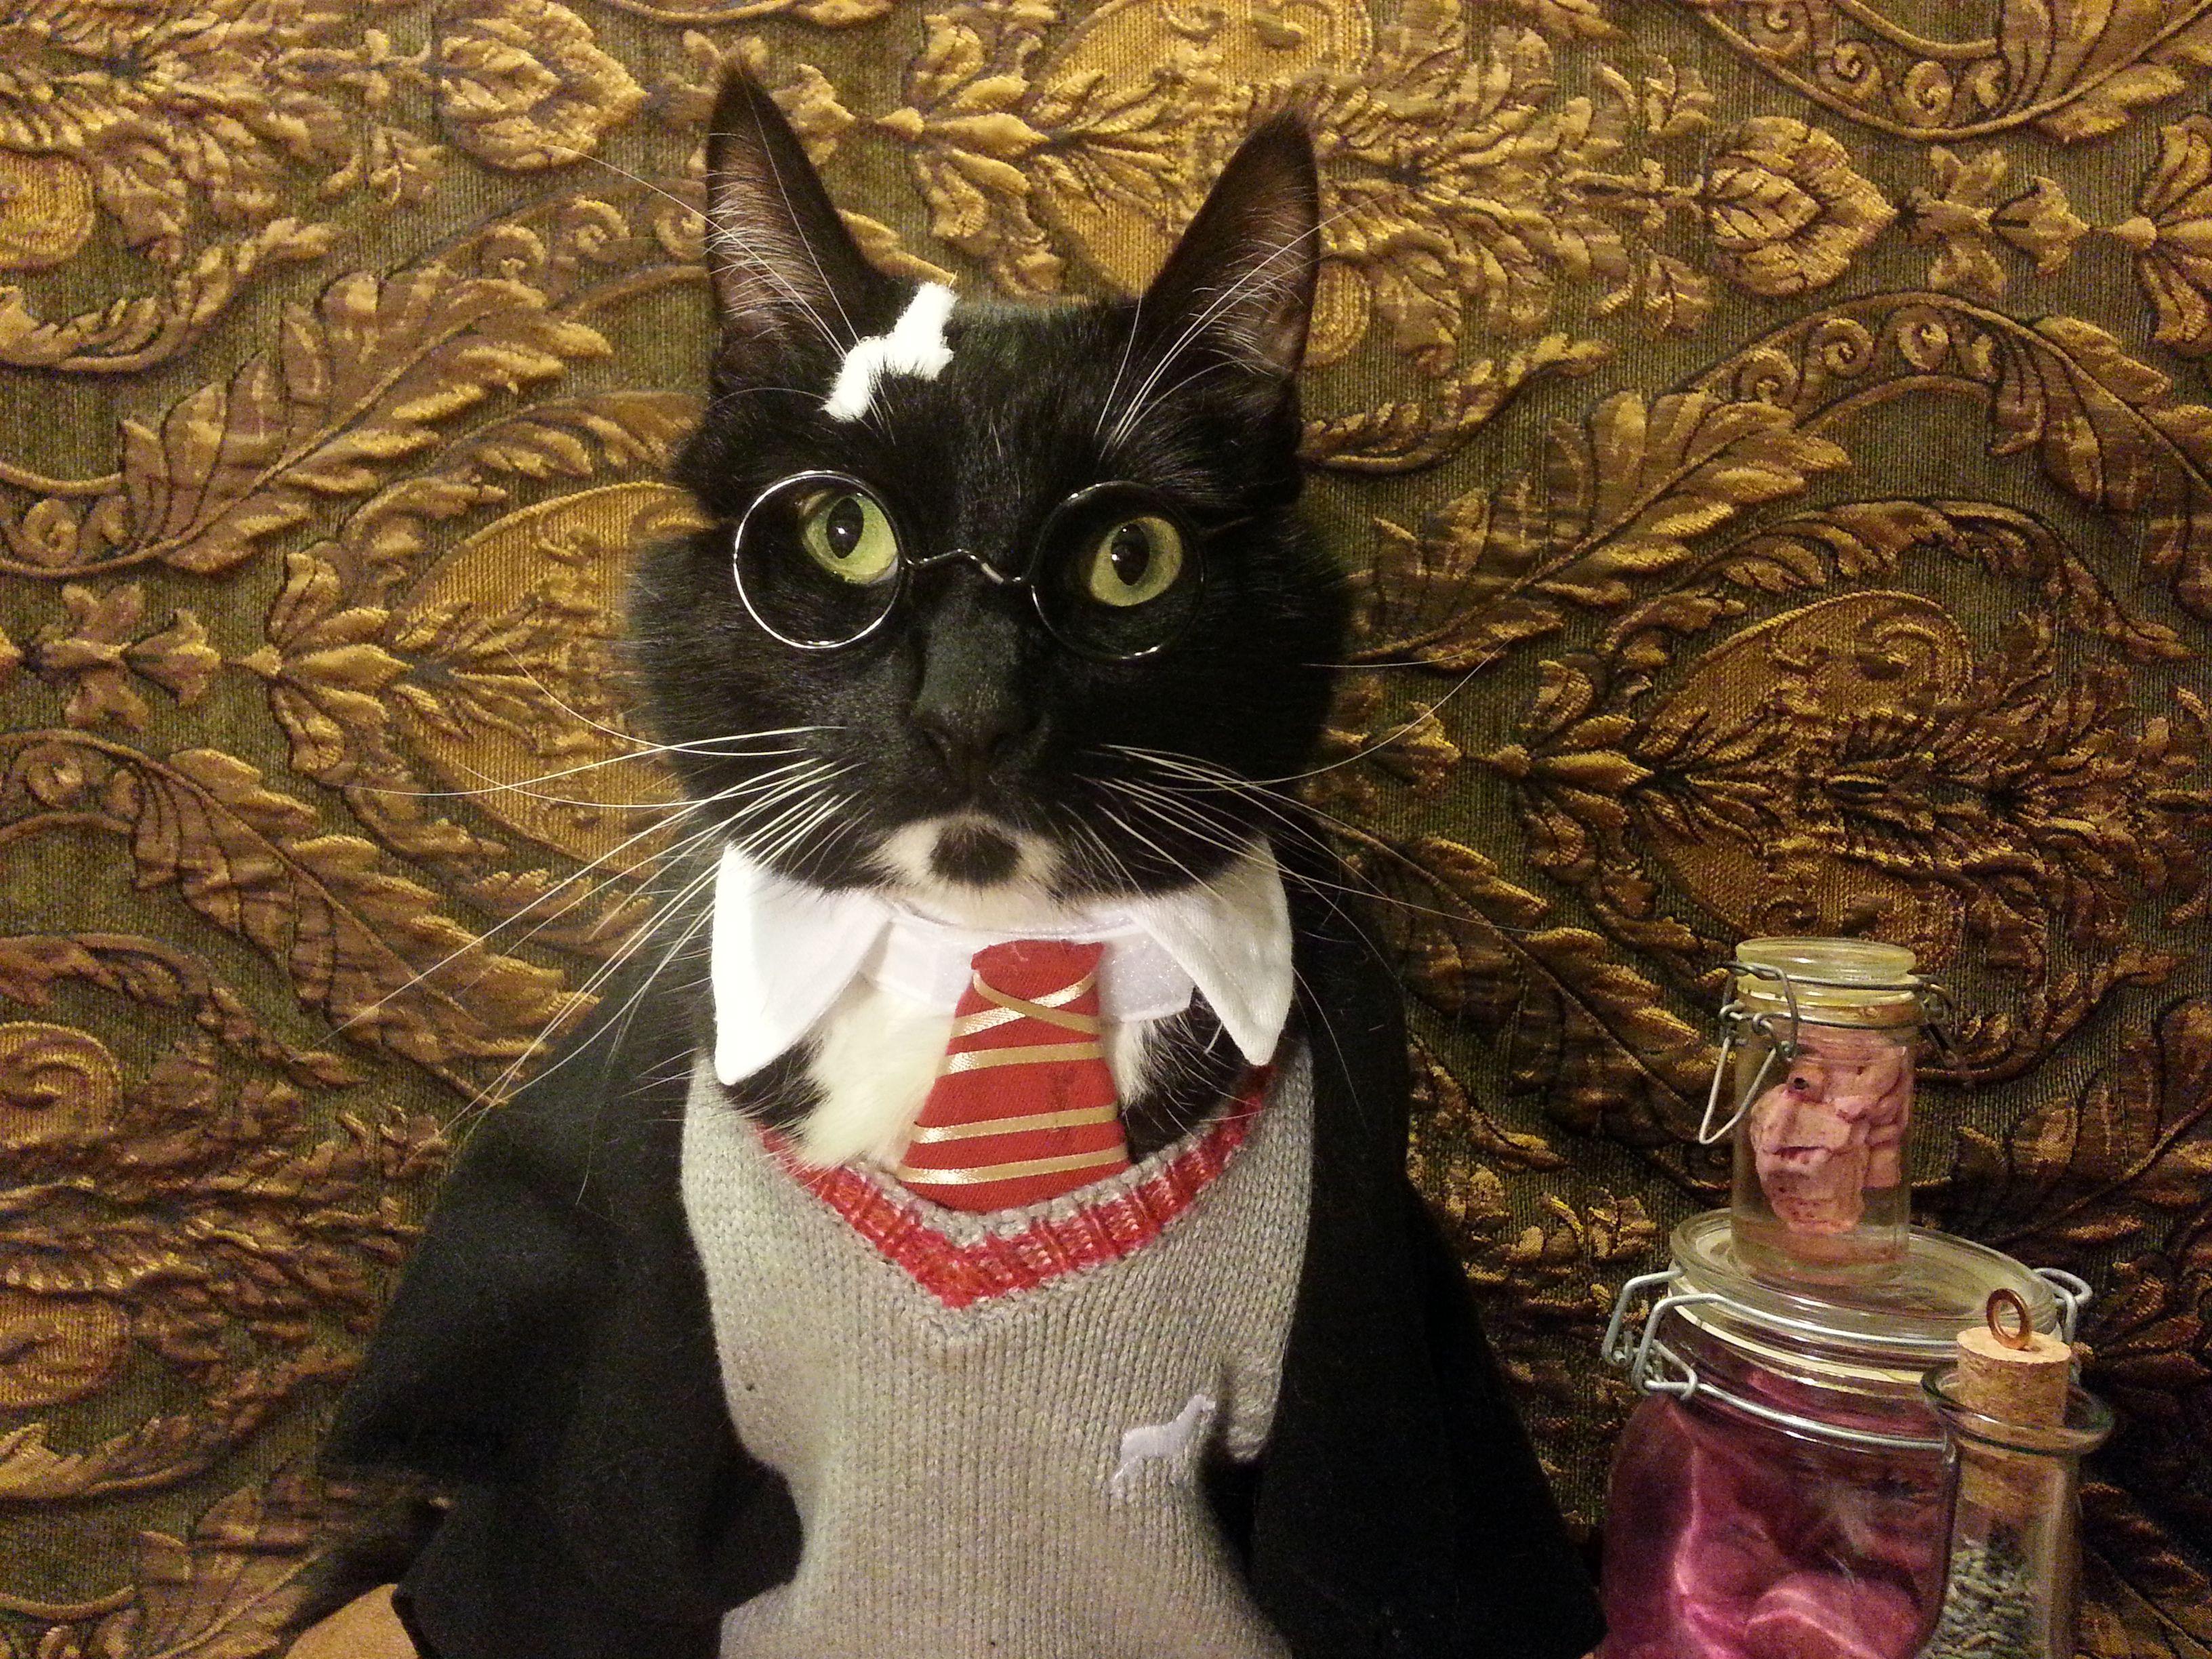 cat in Harry Potter costume